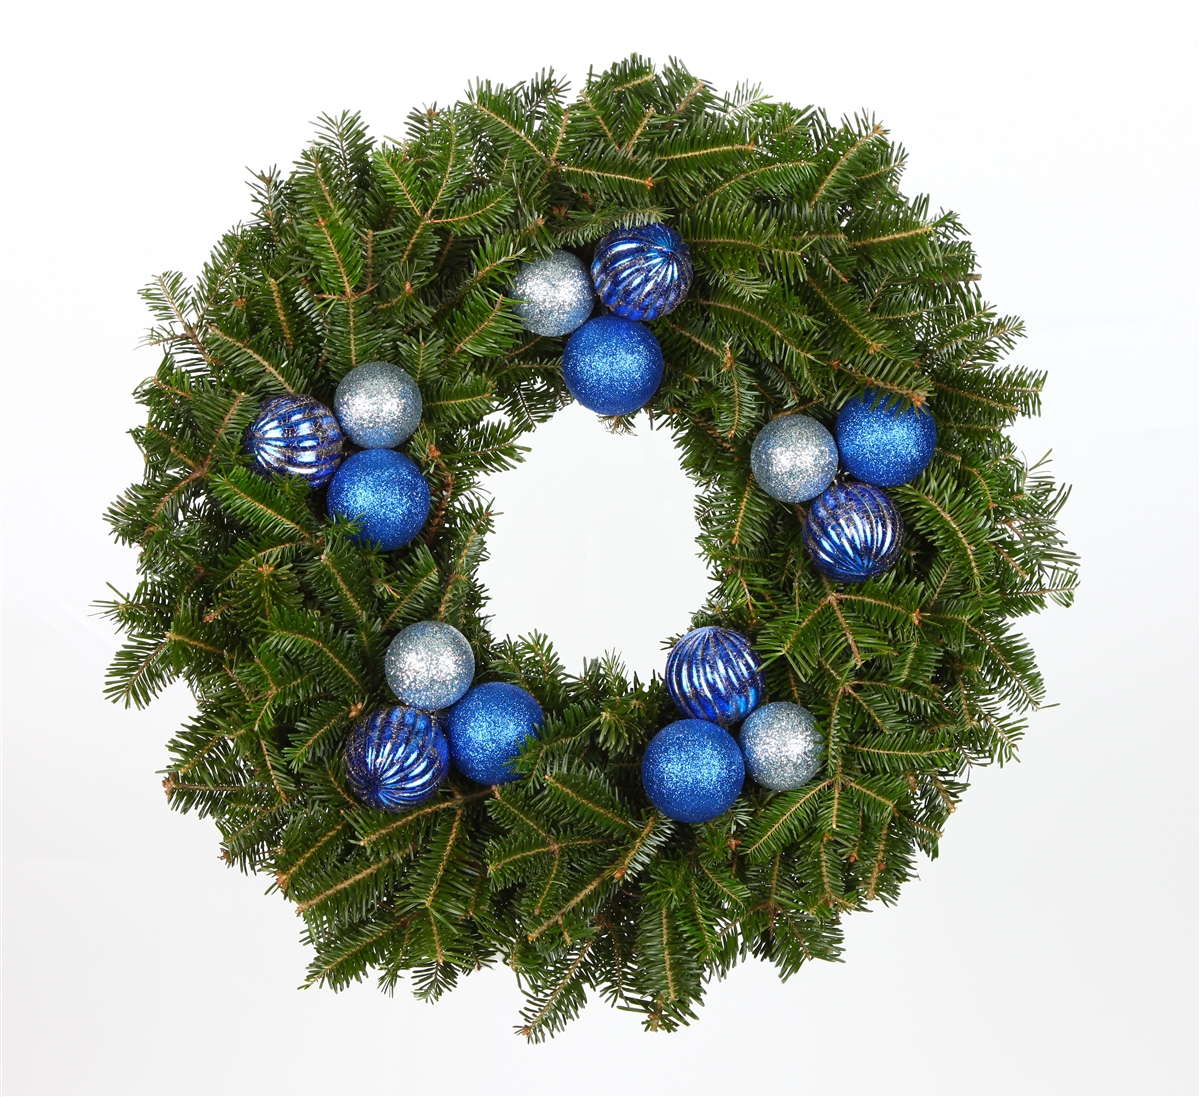 blue ornaments real fraser fir wreath fresh cut live - Blue Christmas Wreath